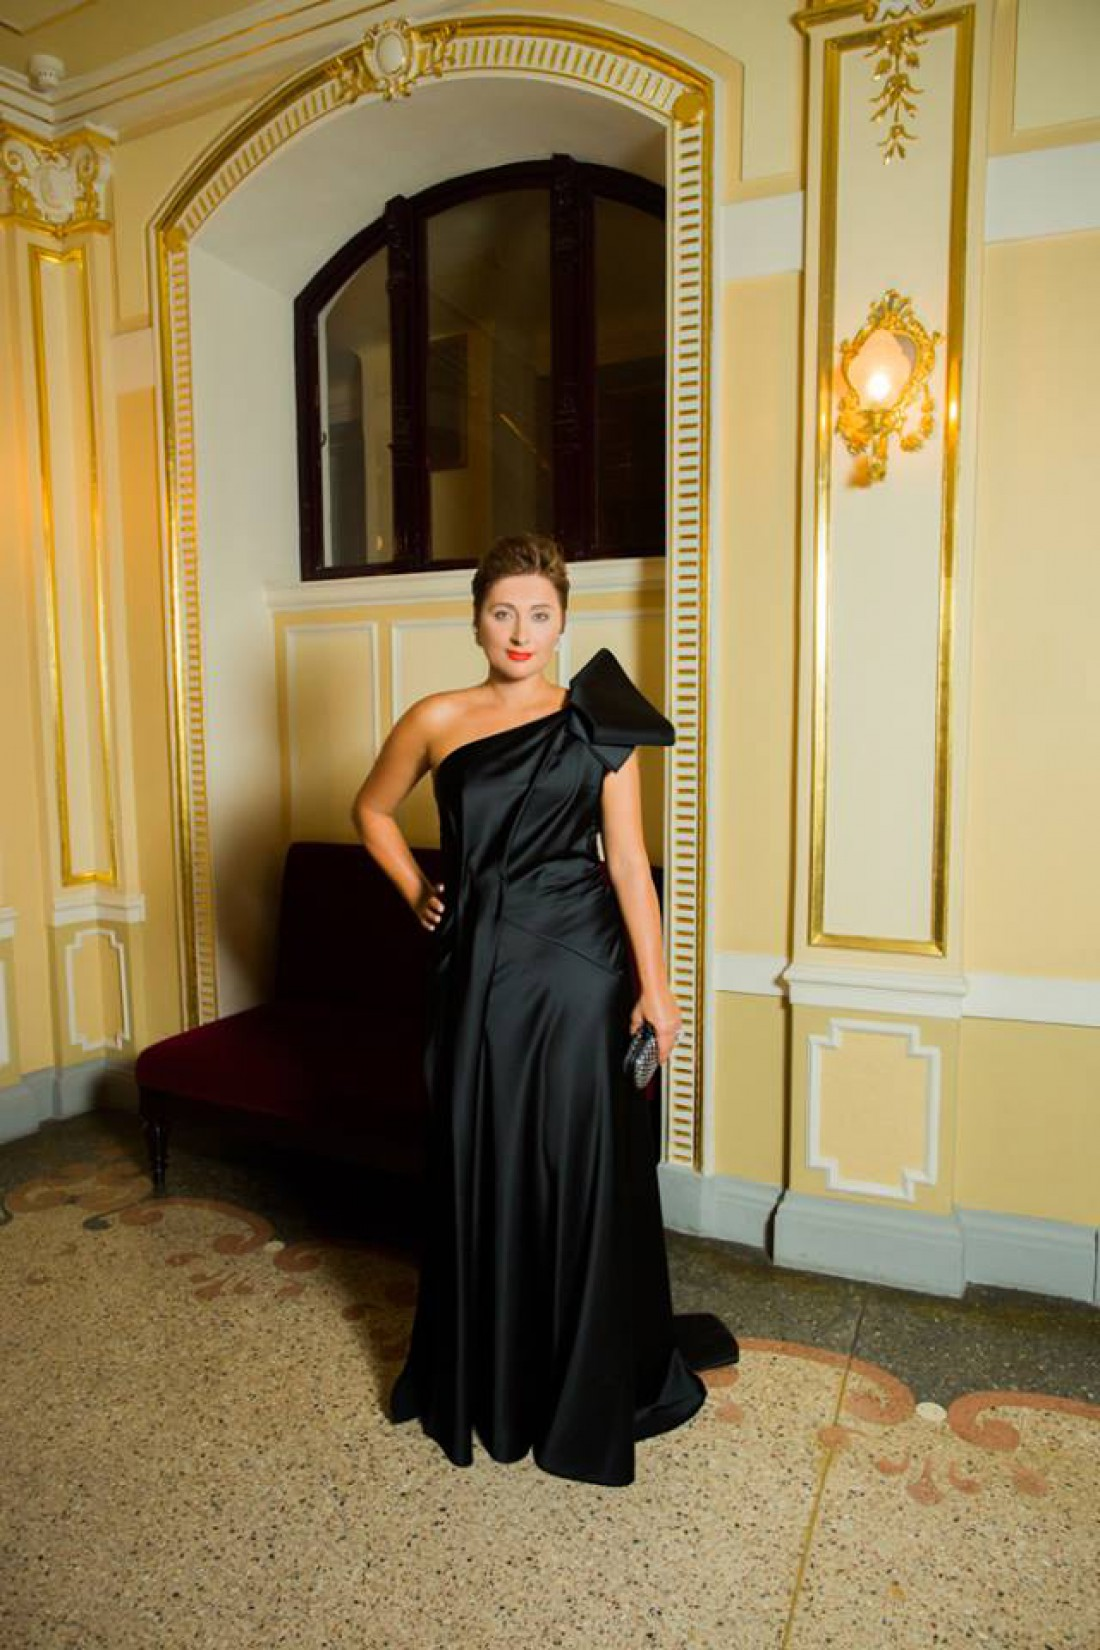 Церемония открытия ОМКФ 2016: Виктория Тигипко